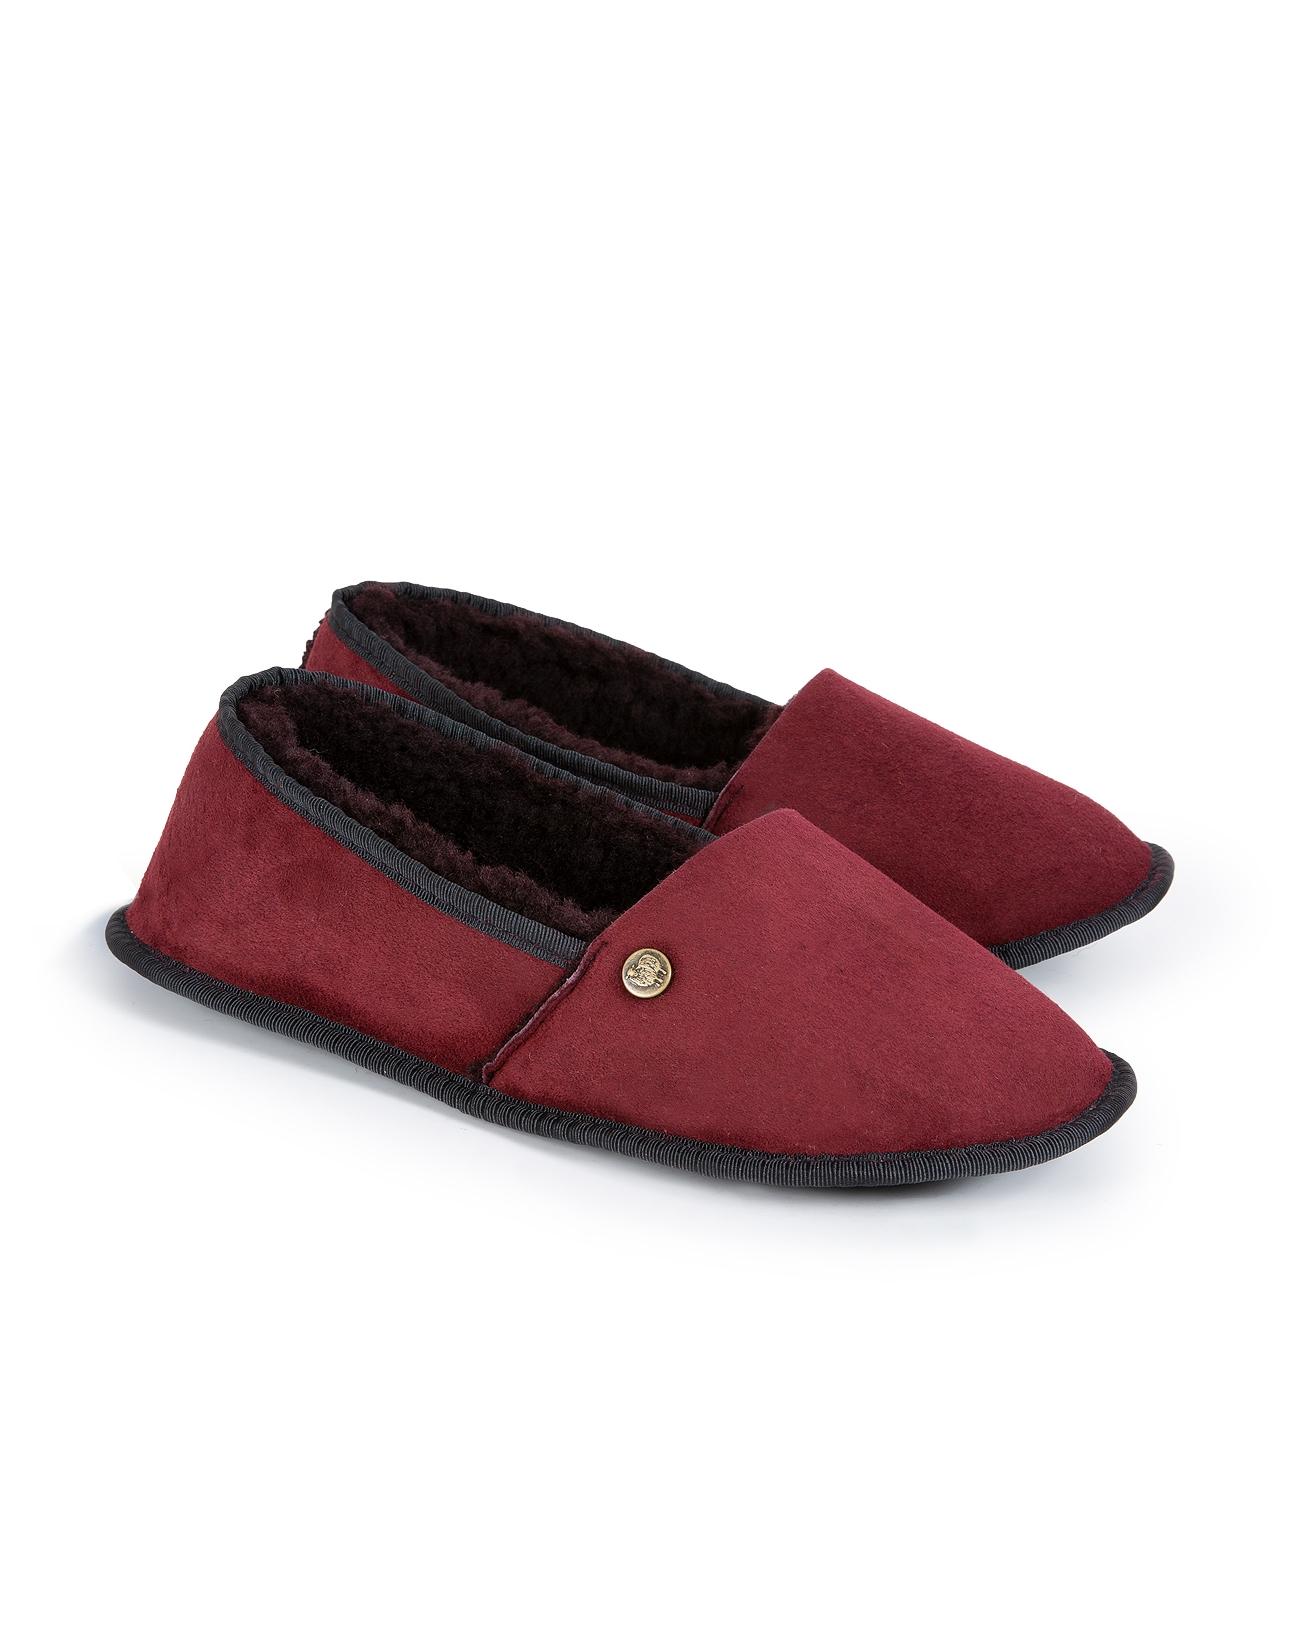 Venetian Slippers - Size 6 - Claret - 1225